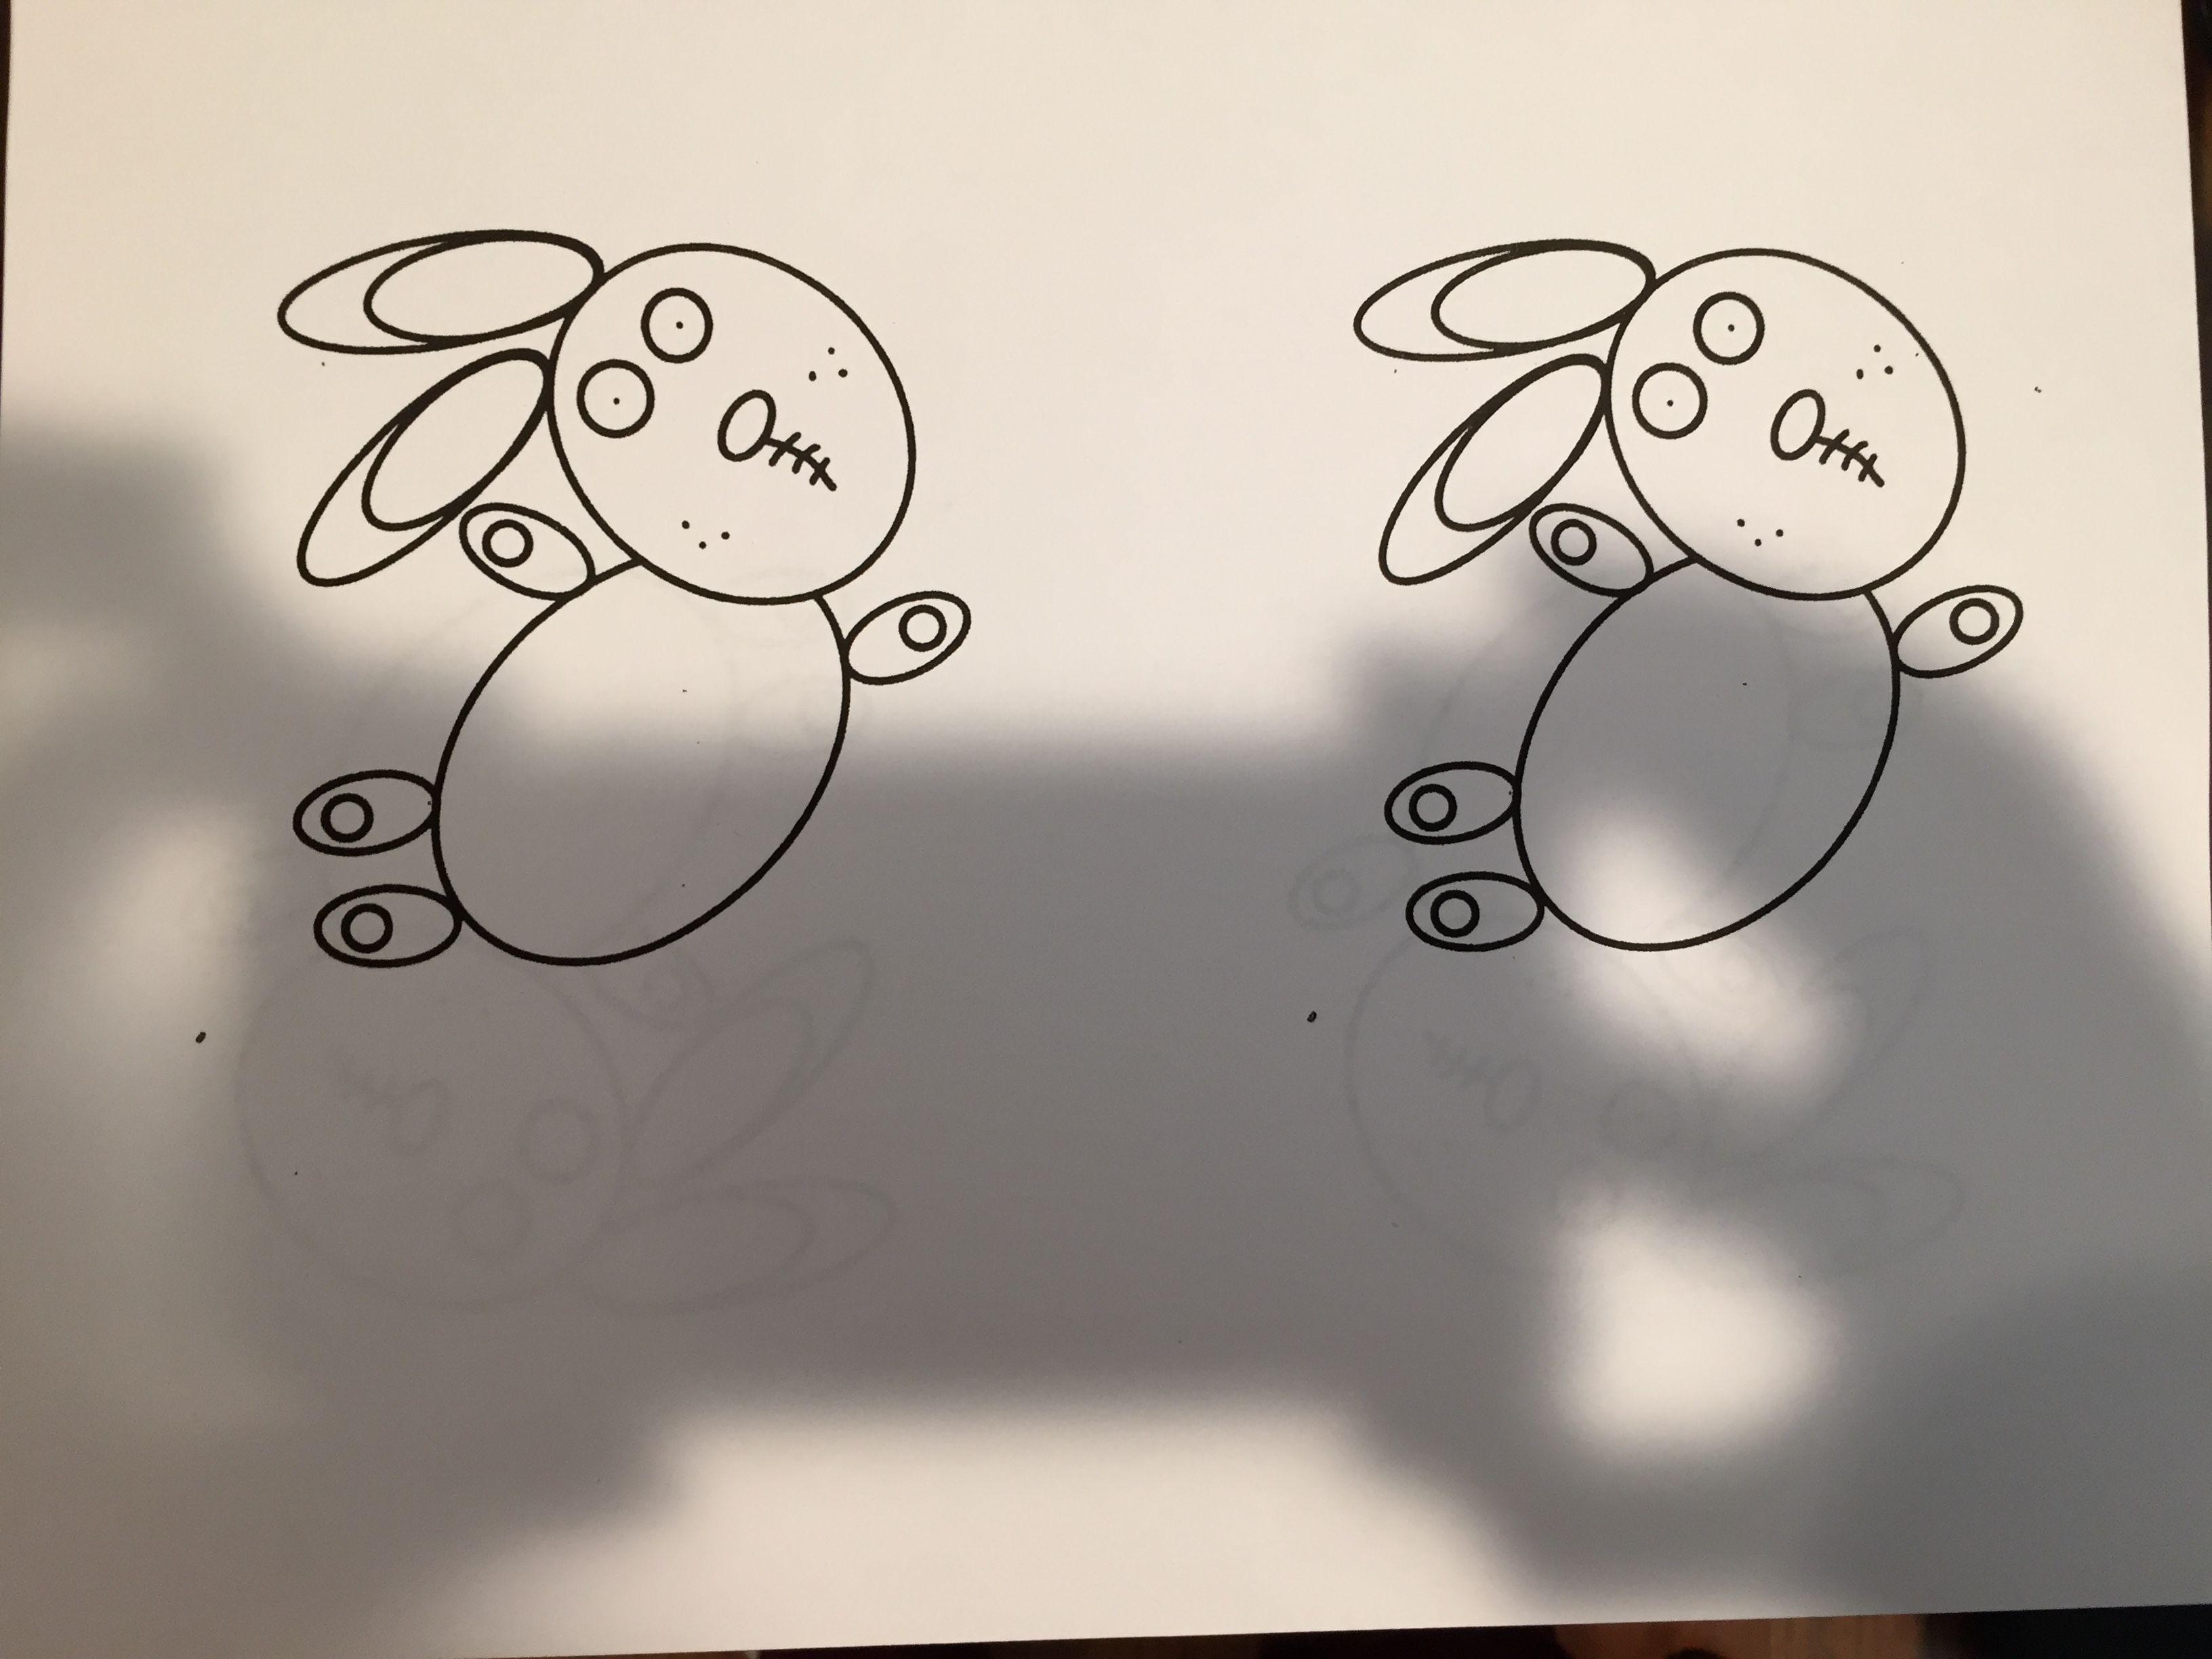 Template for knuffle bunny activity. | Knuffle Bunny | Pinterest ...